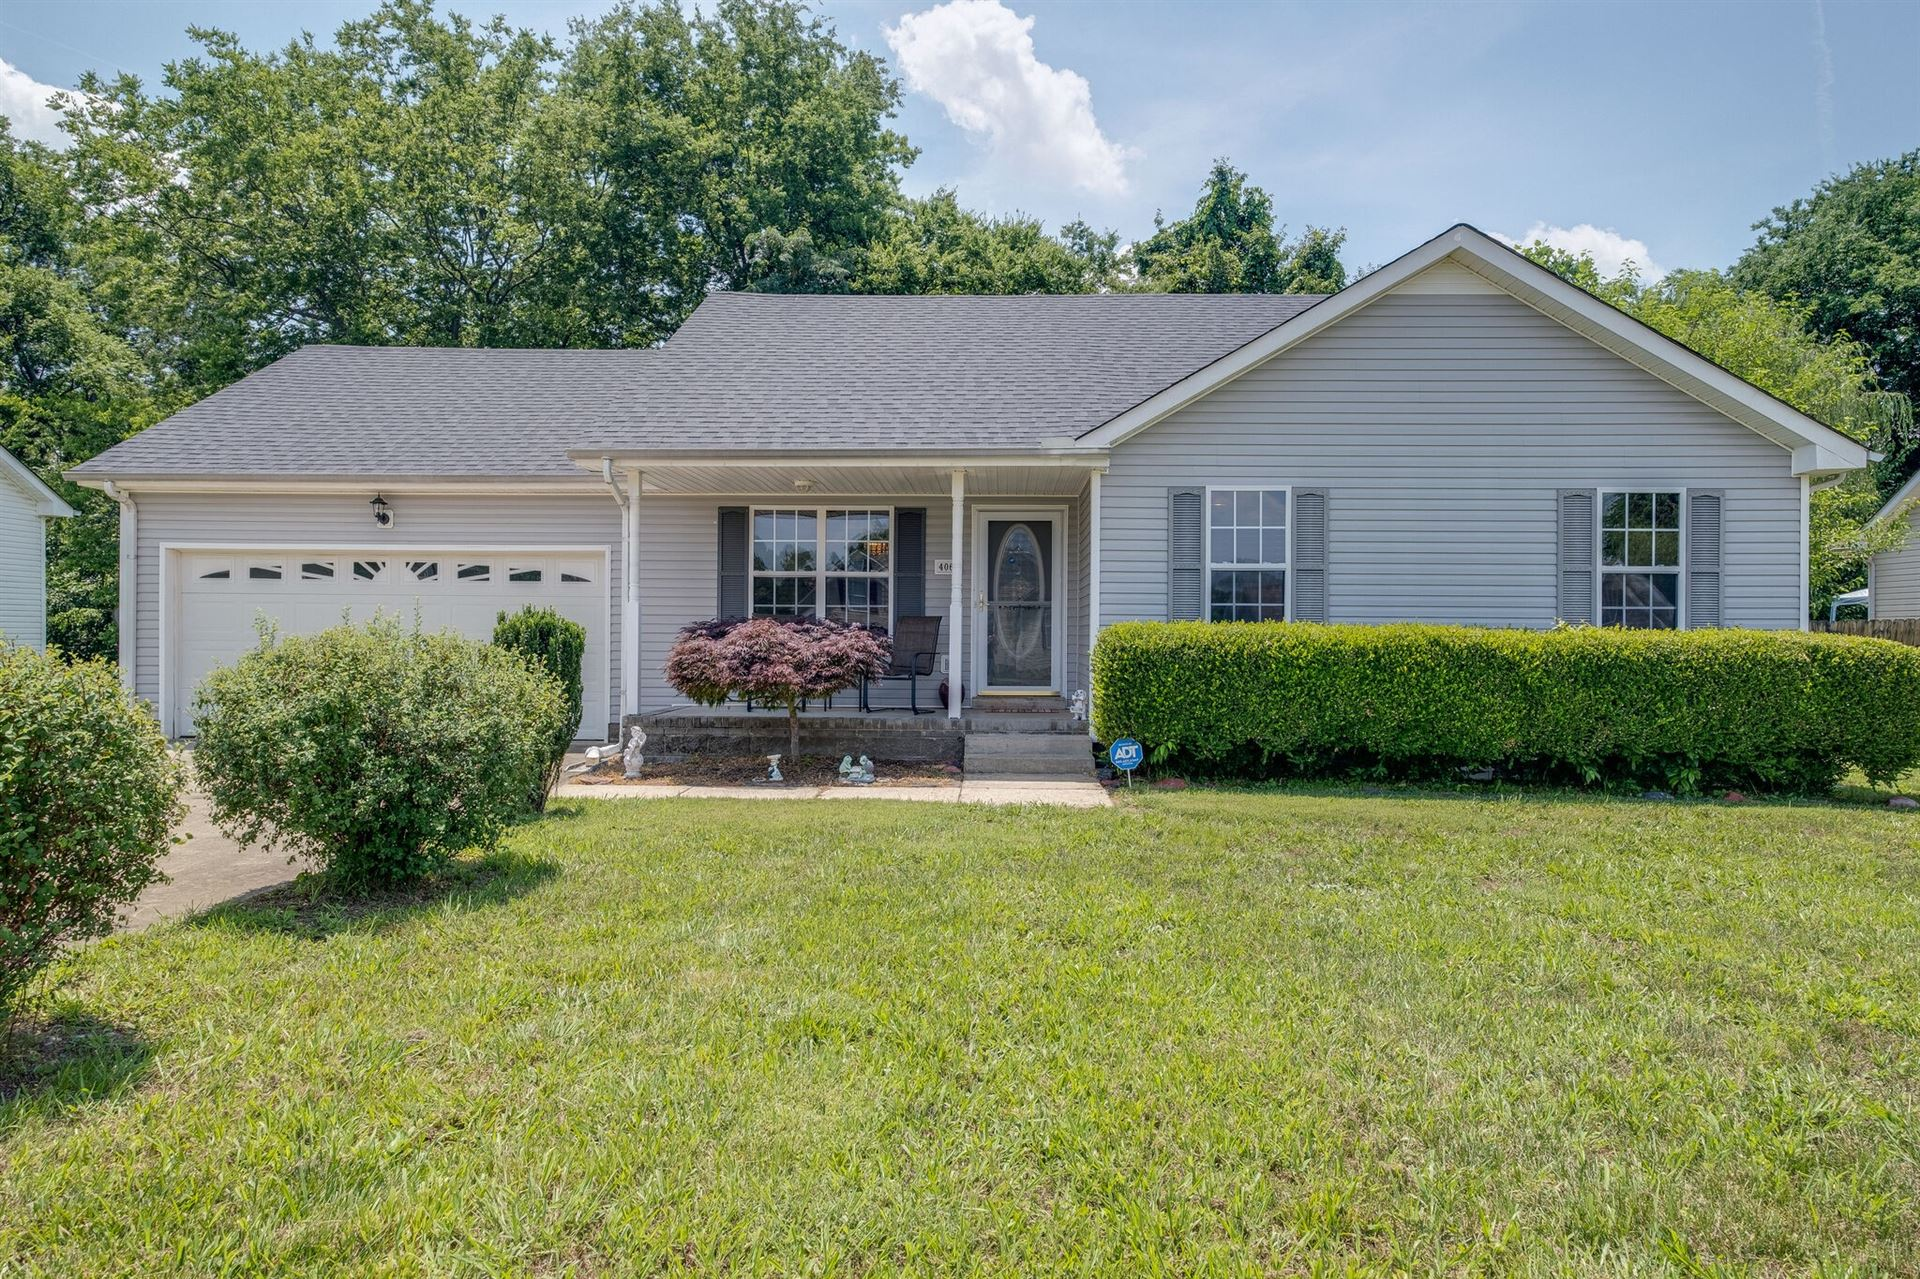 4065 New Grange Cir, Clarksville, TN 37040 - MLS#: 2264086